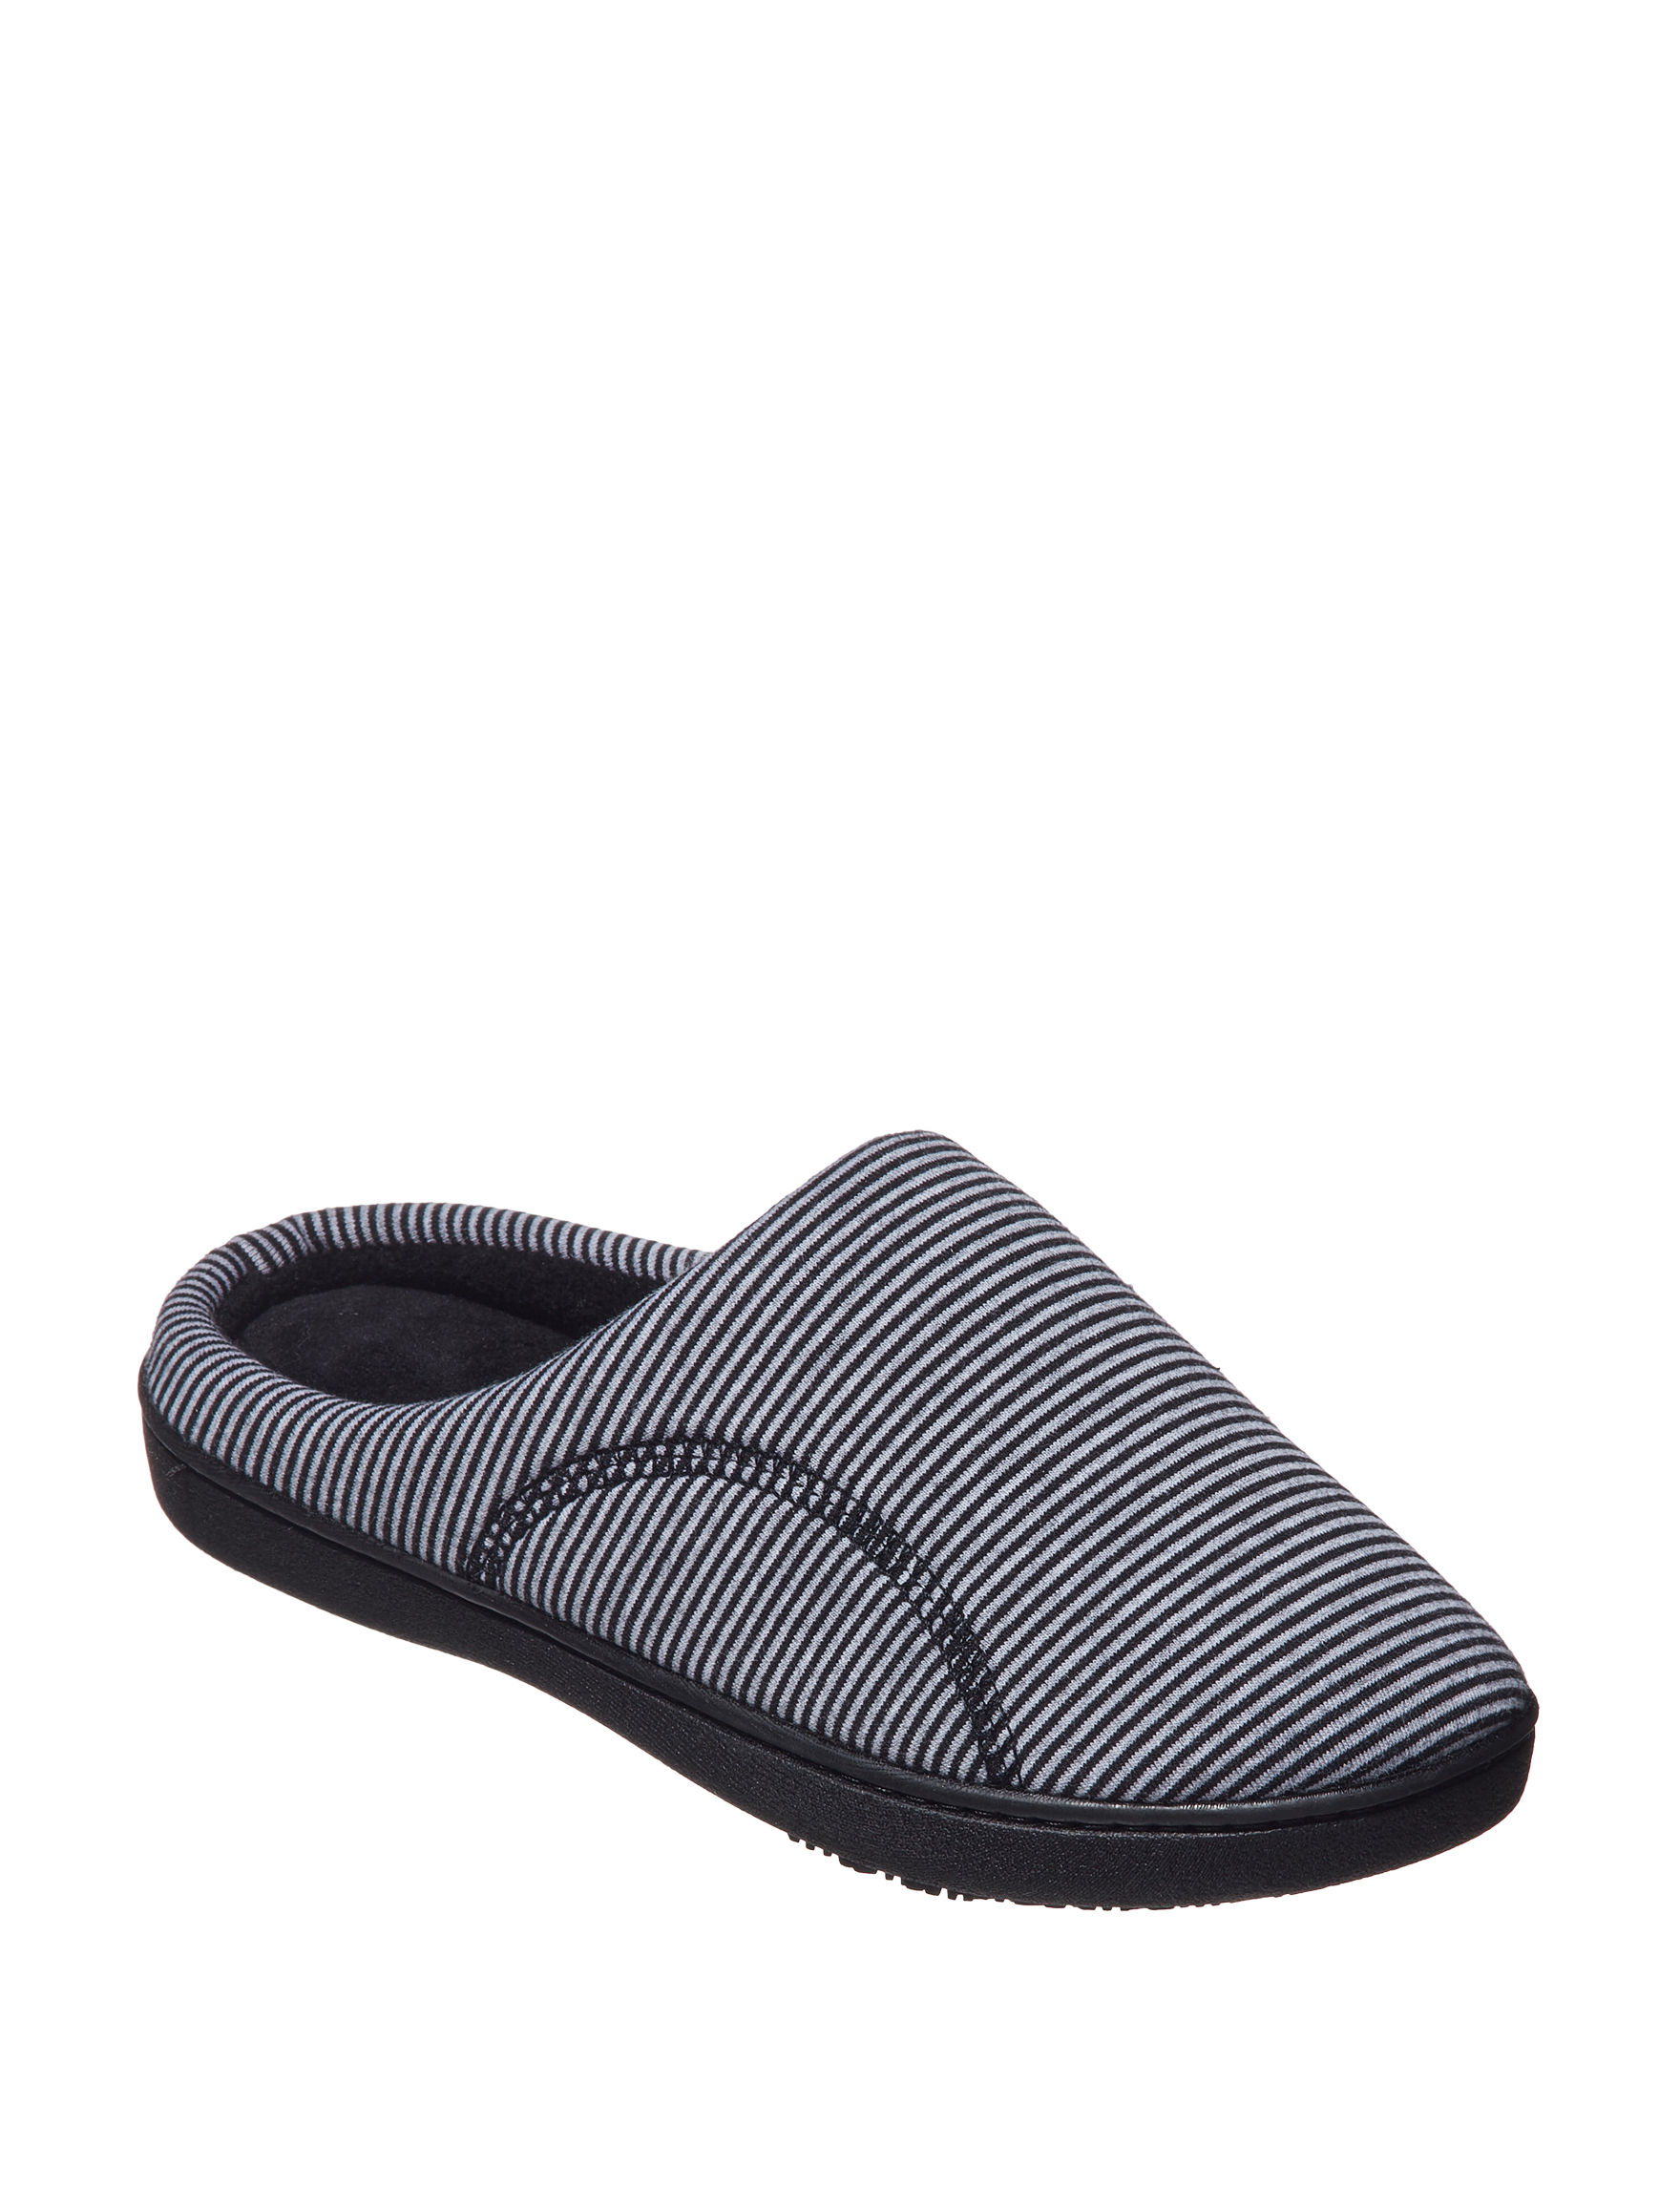 Isotoner Black Stripe Slipper Shoes